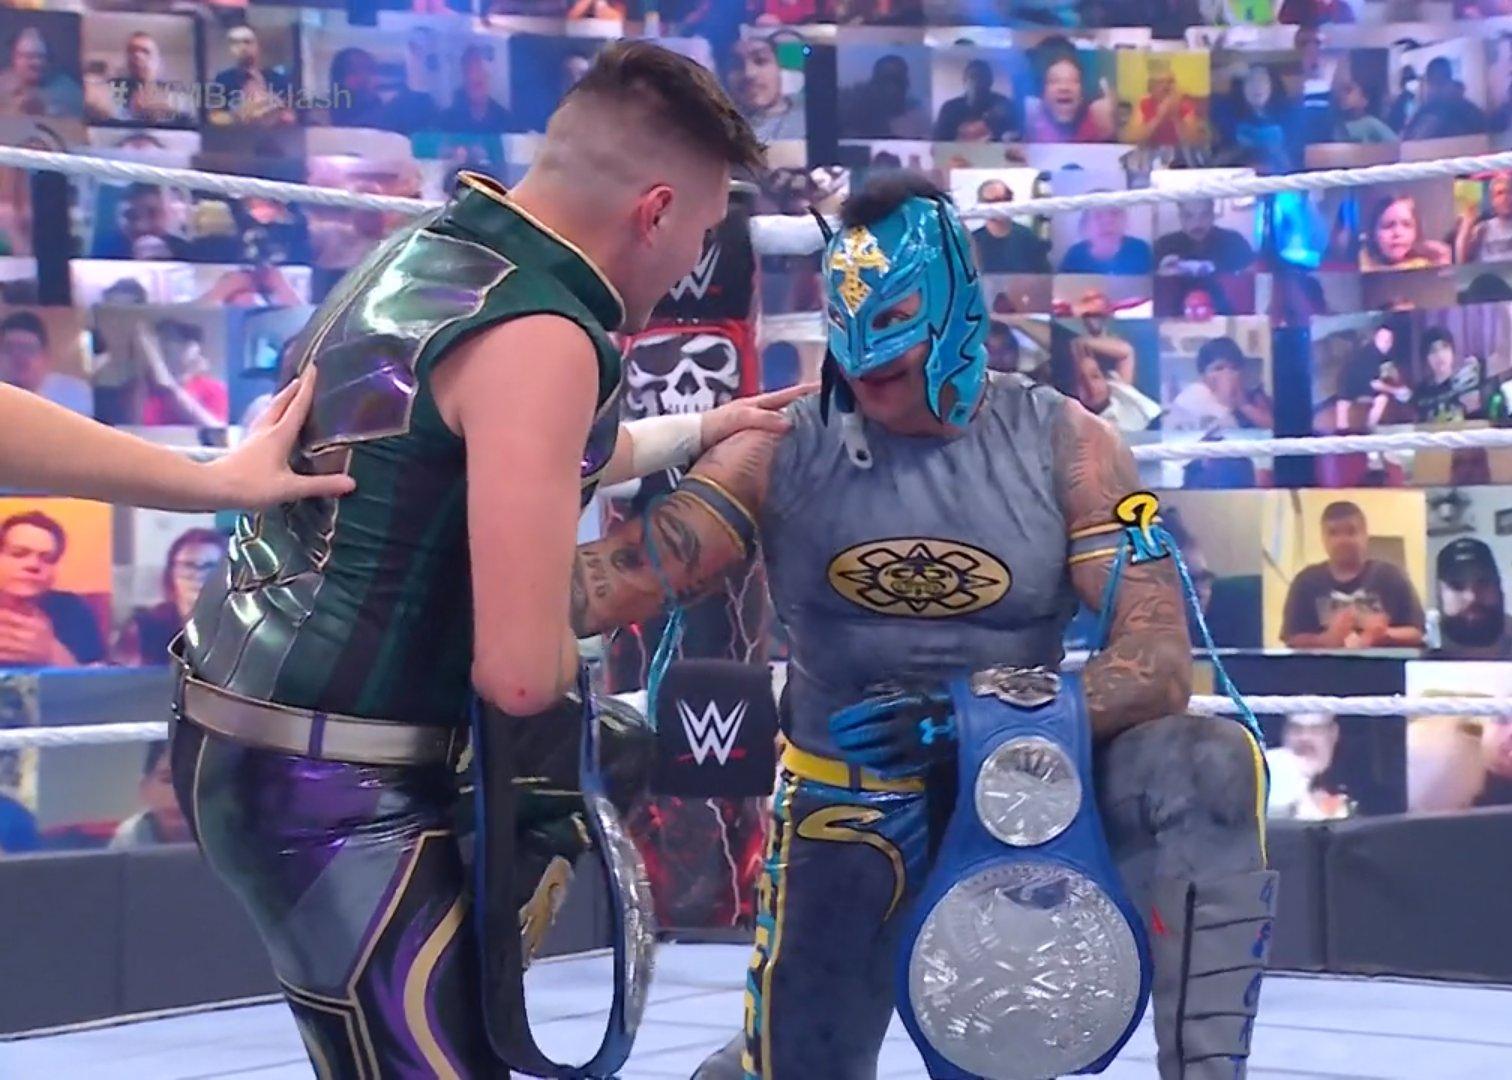 Rey-Dominik-WrestleMania Backlash